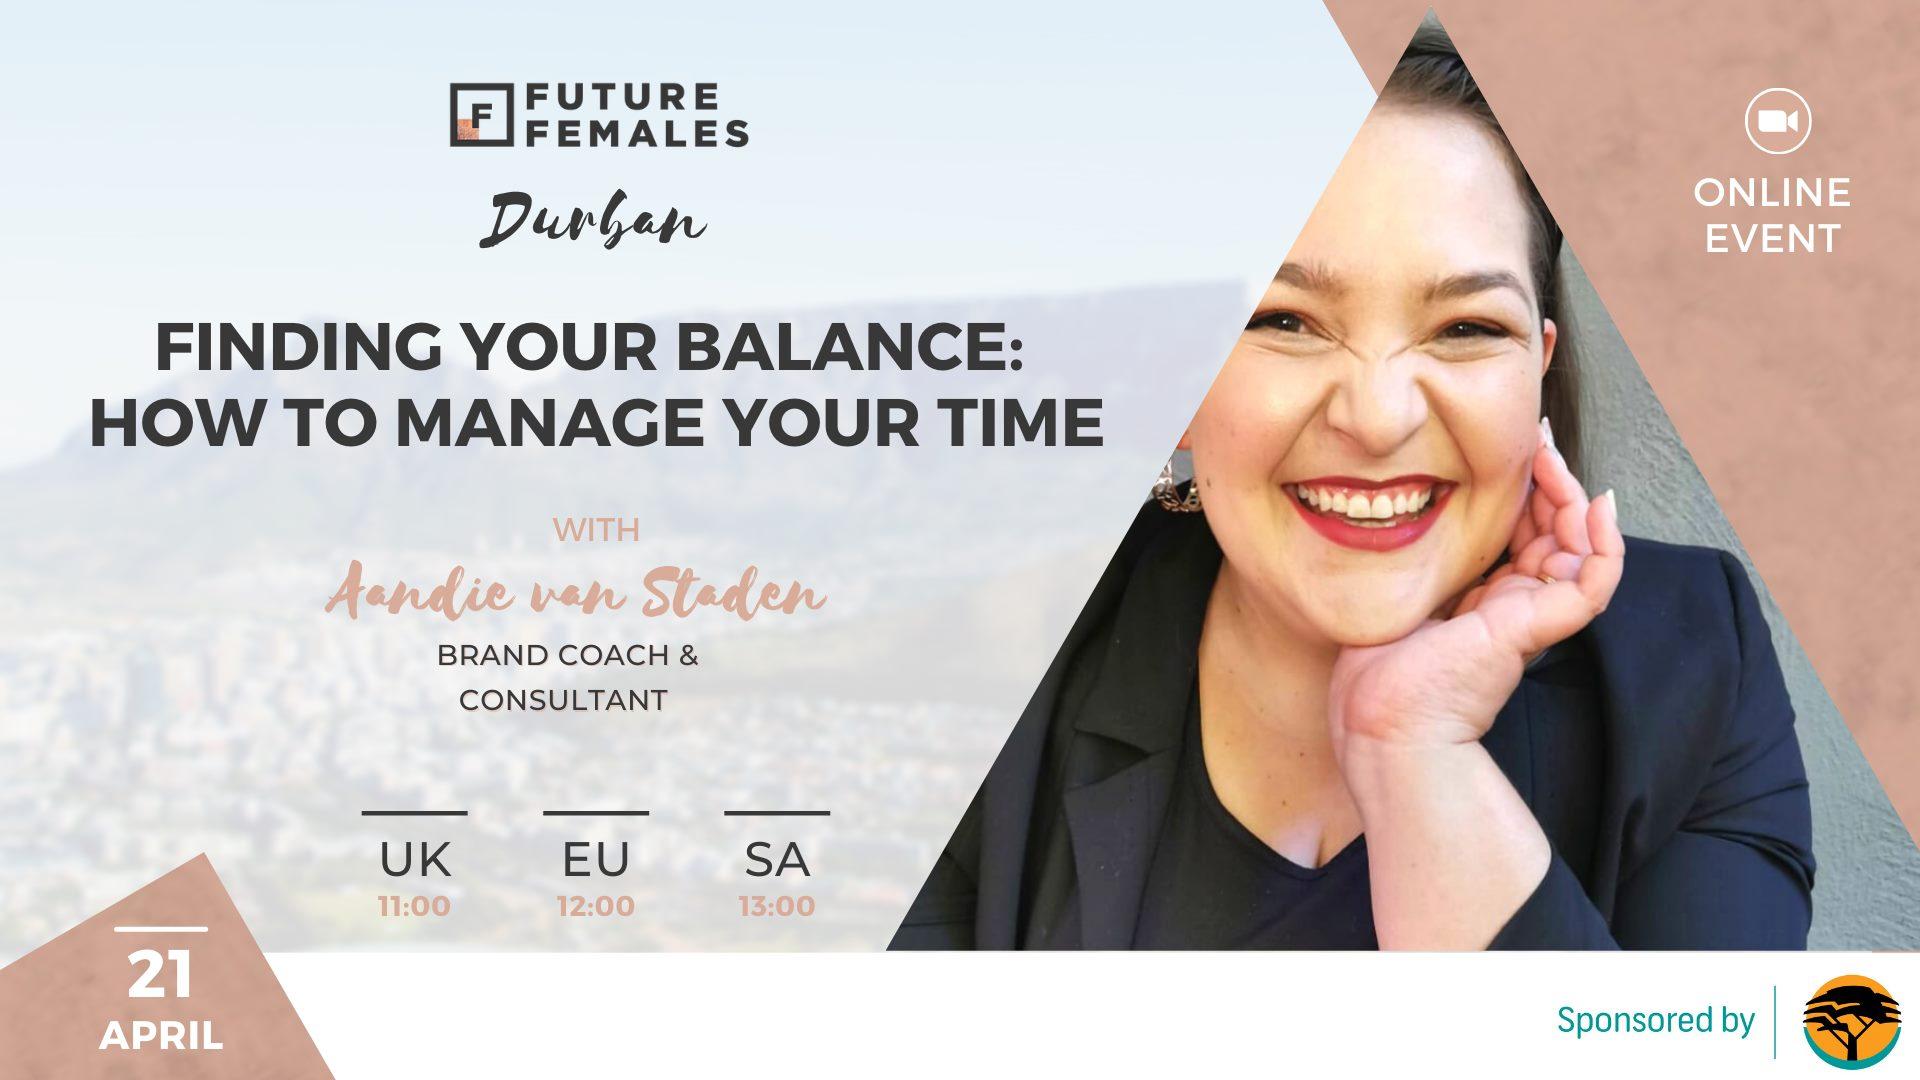 Future Females Durban Event - 20 May April